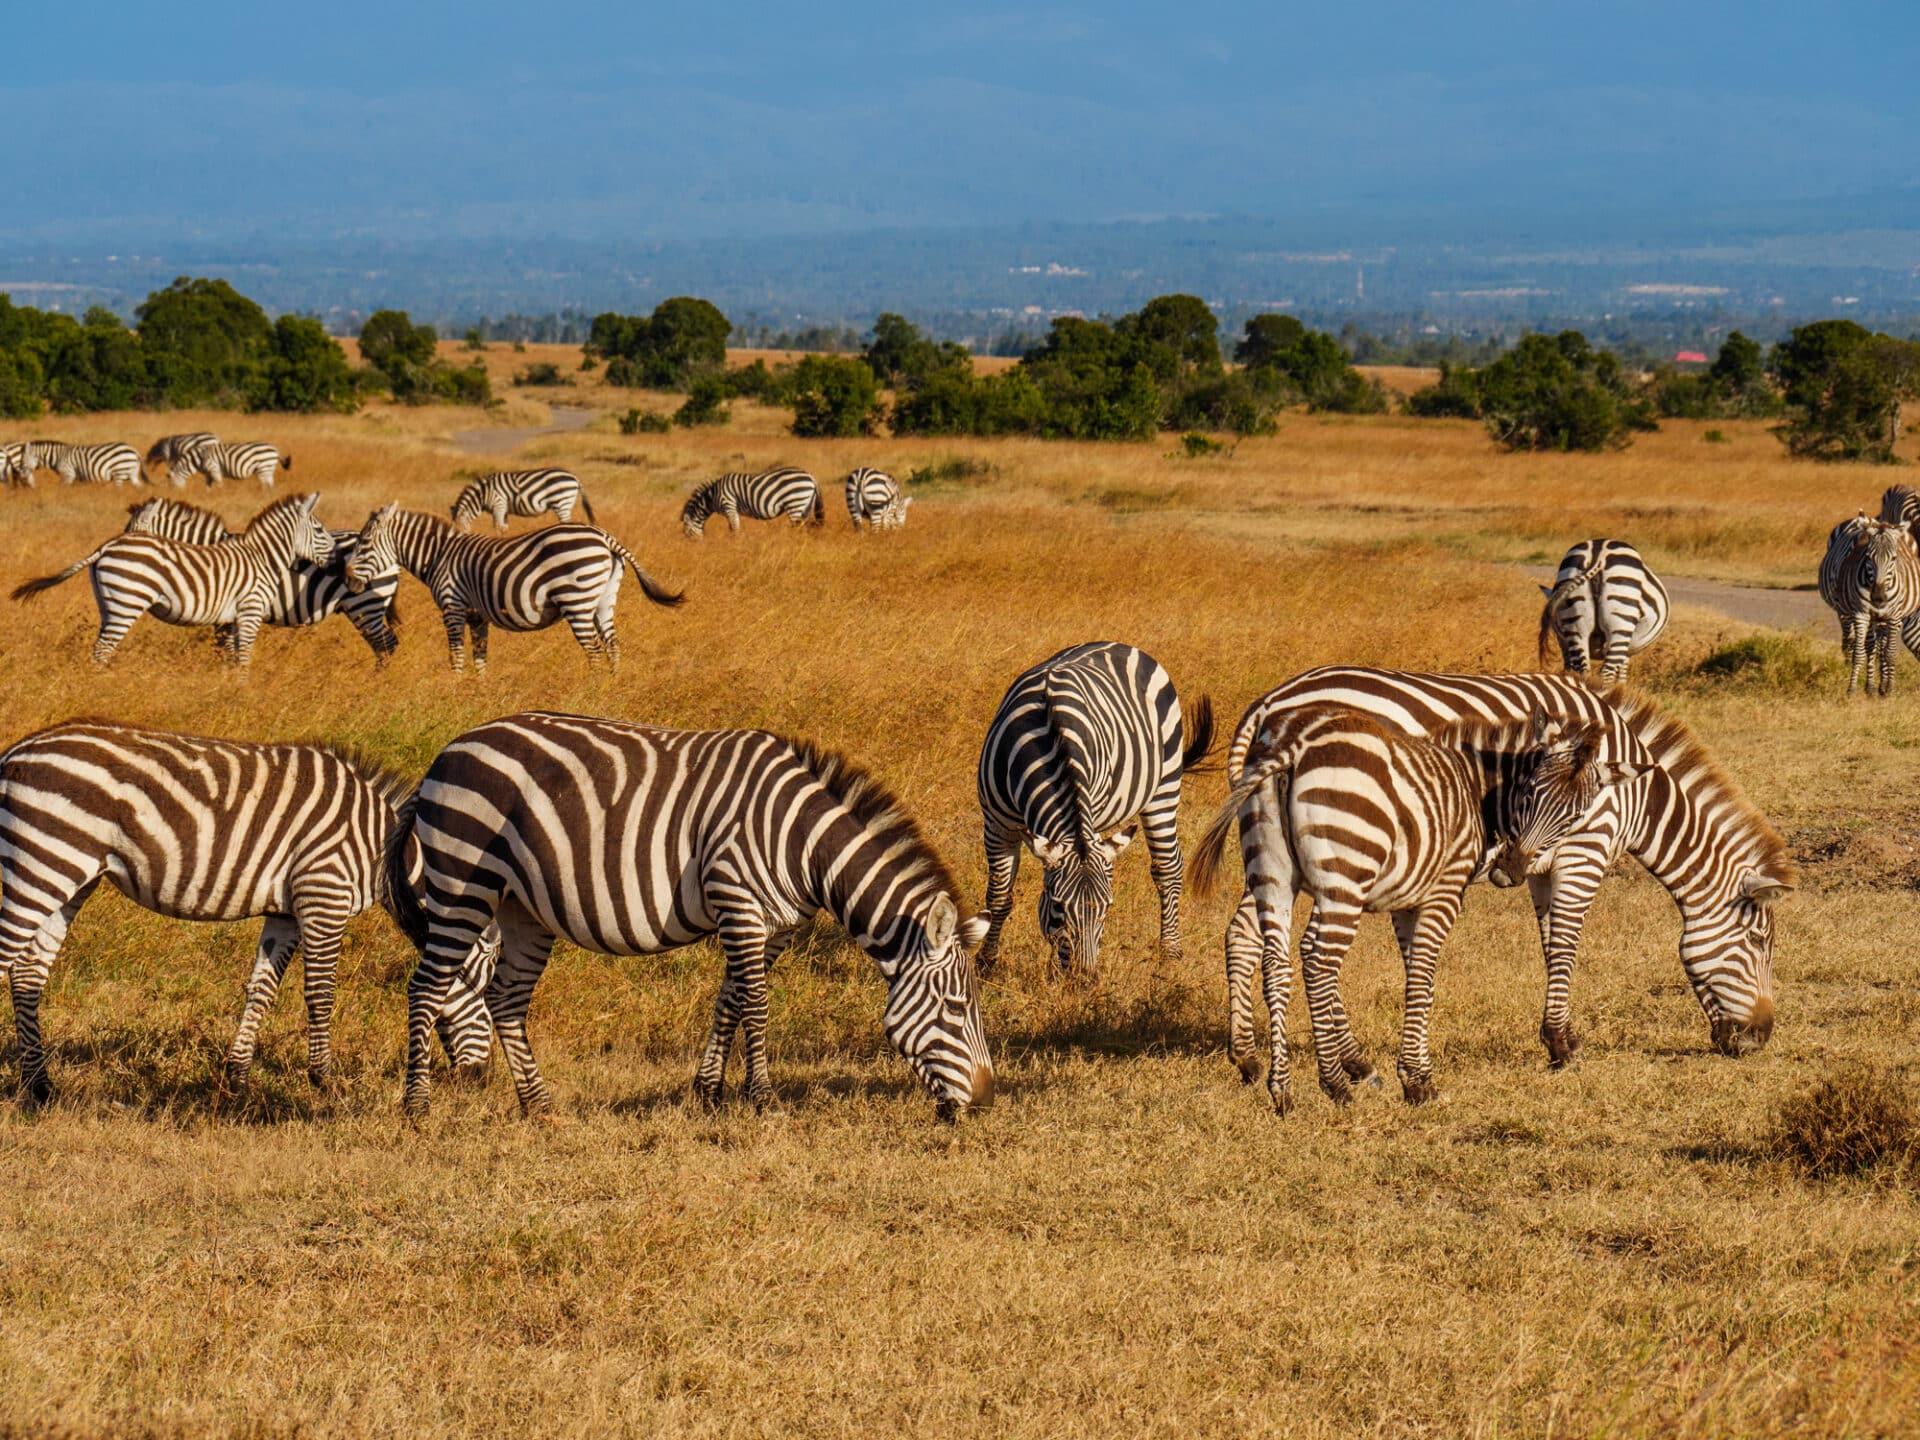 Grevys Zebra Equus Grevyi Marwell Zoo 4